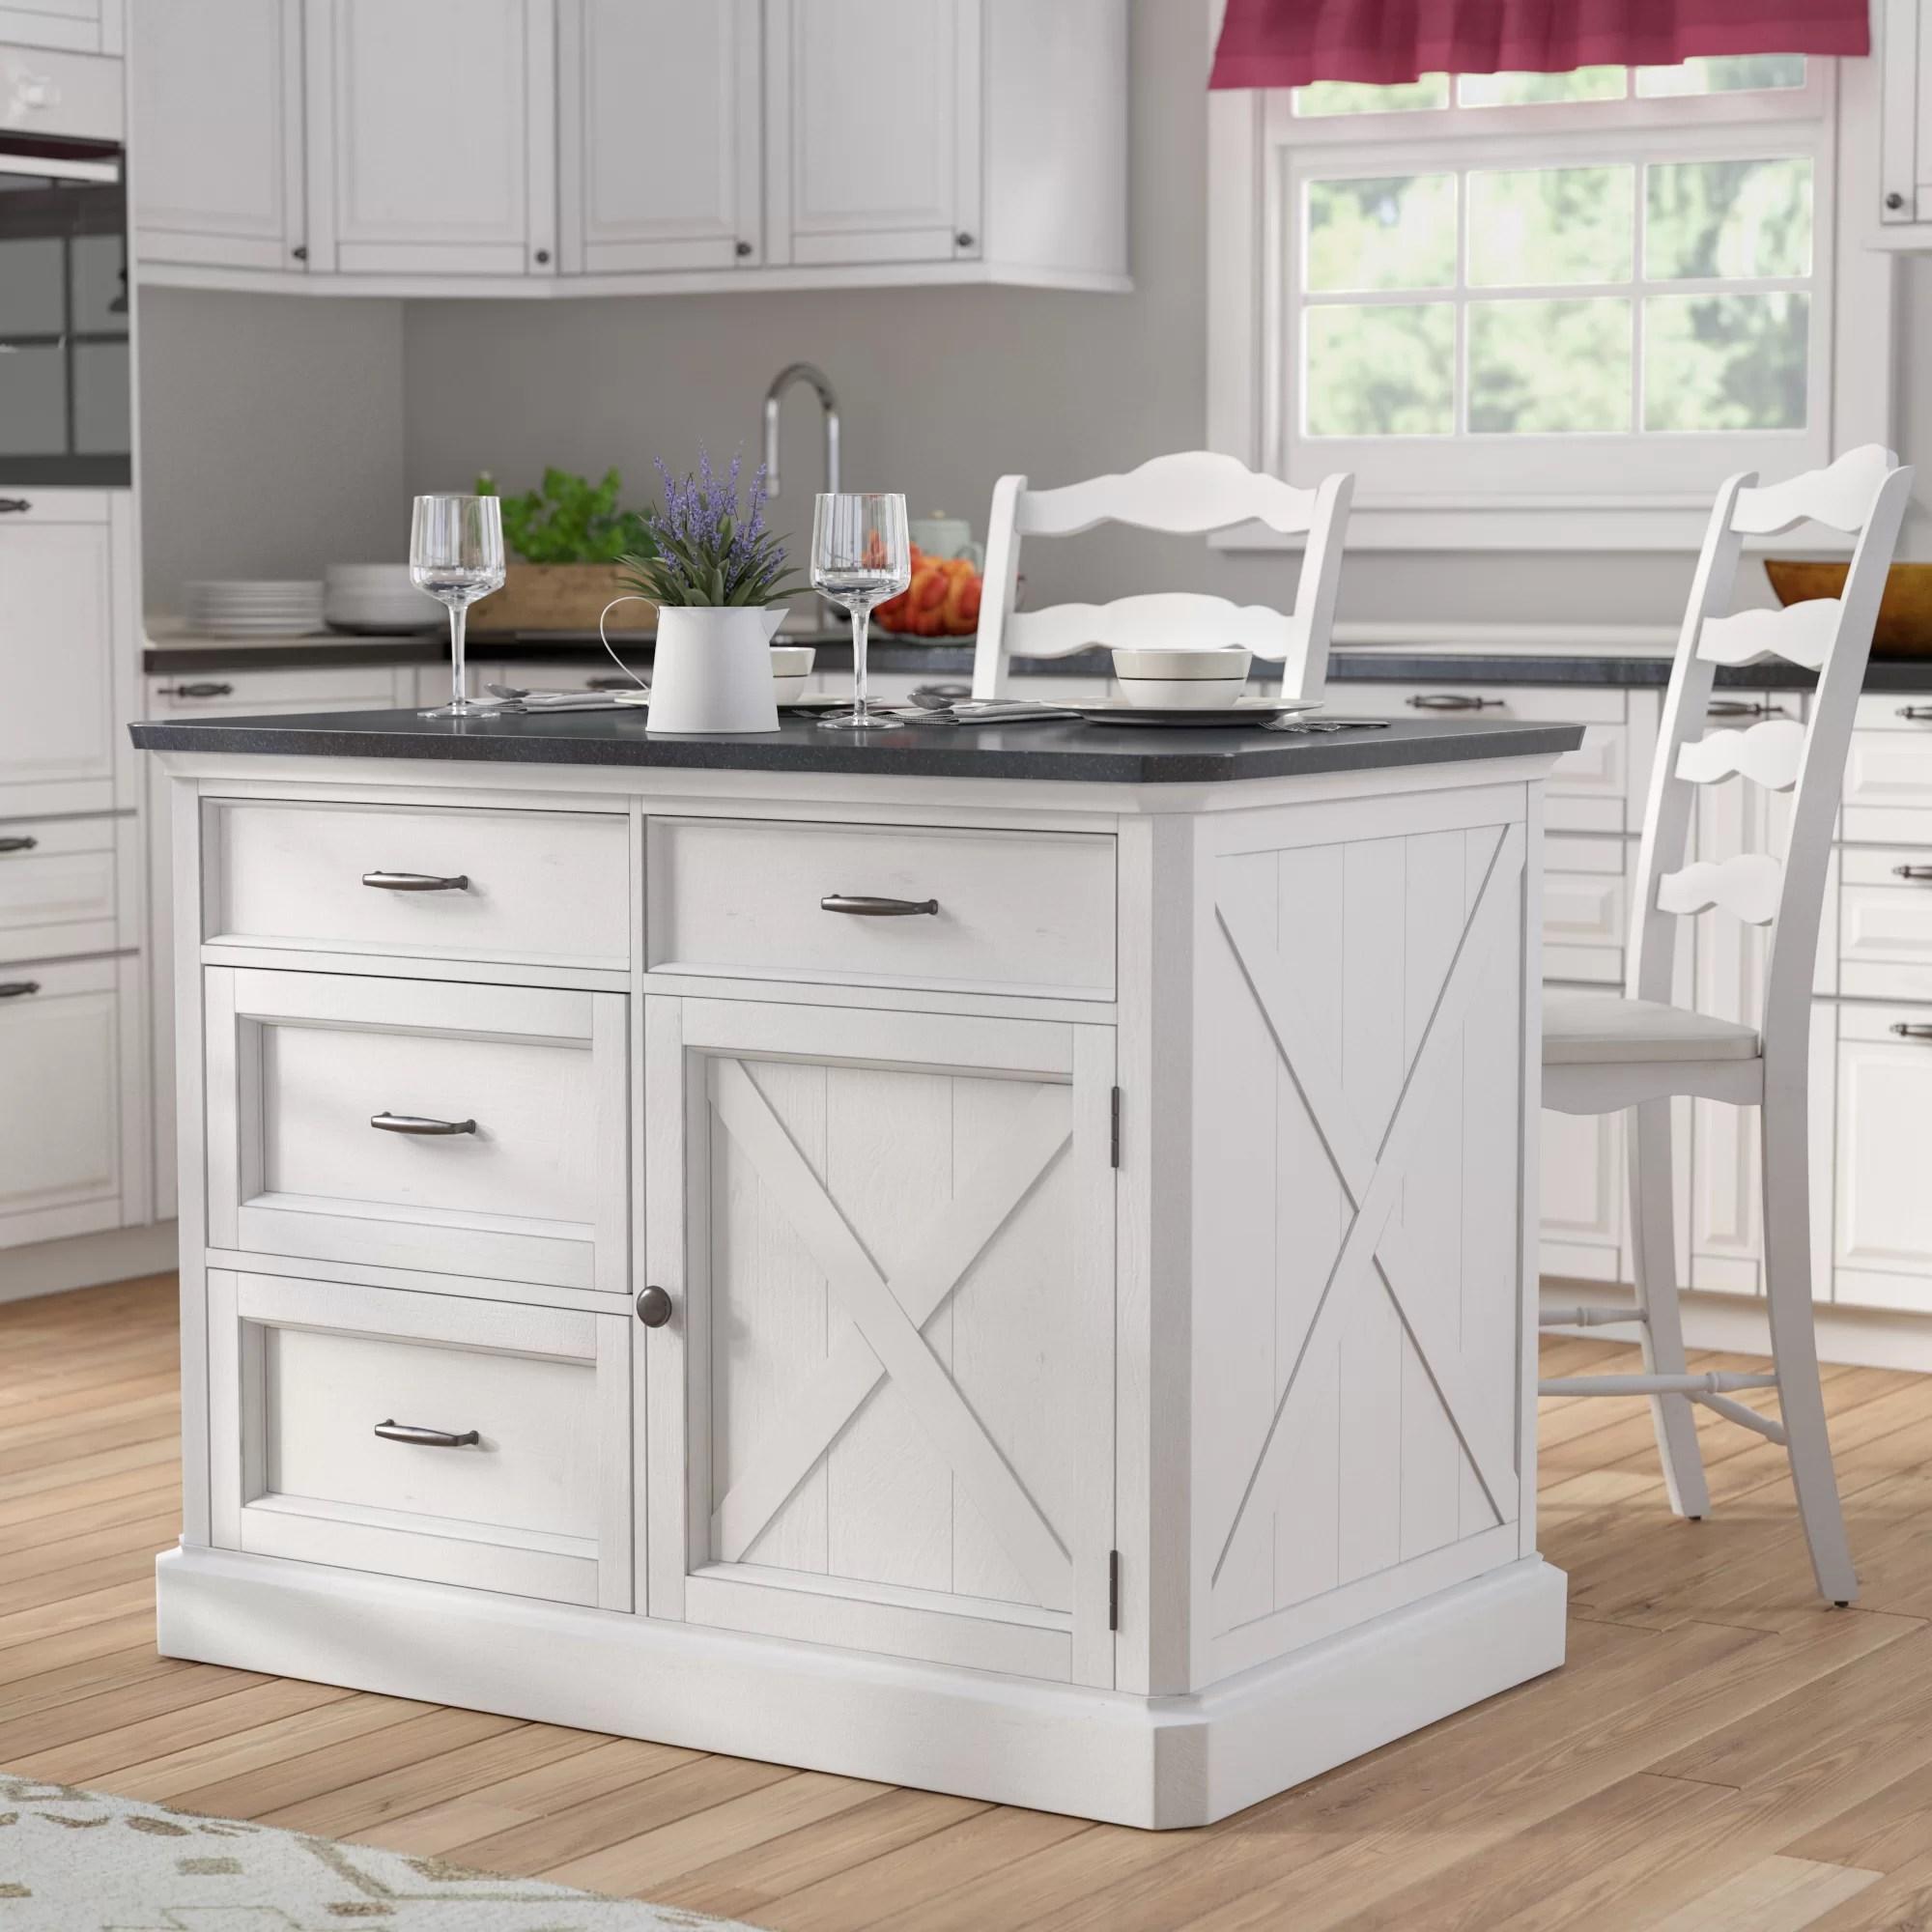 3 piece kitchen set curtain panels island wayfair ca moravia with engineered quartz top